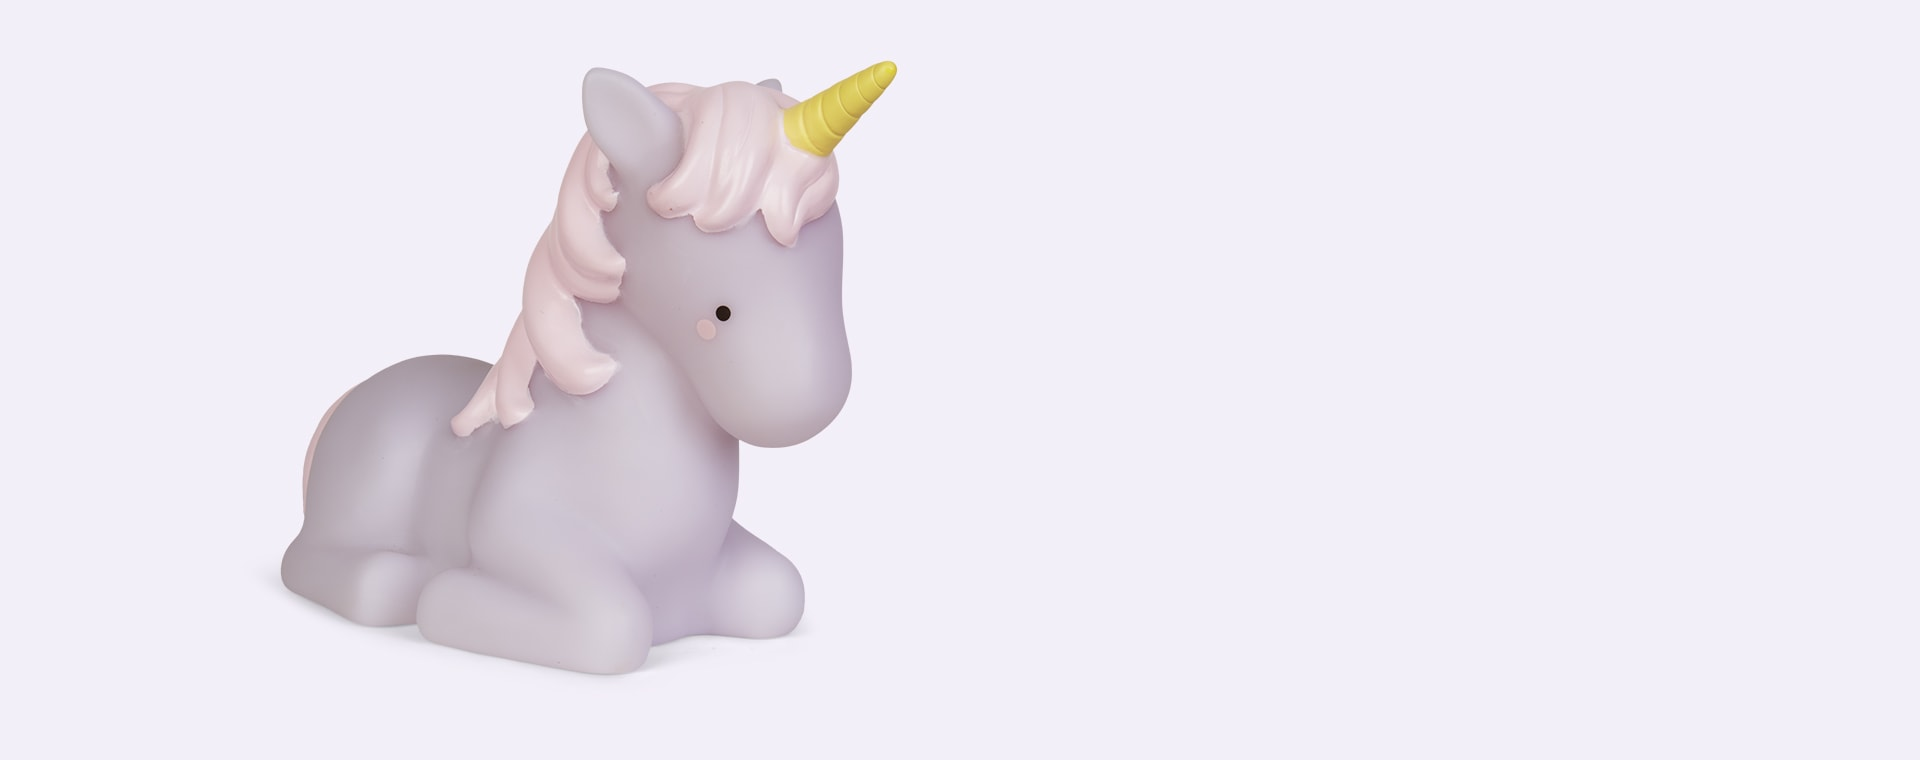 White Lello Teeny & Tiny Unicorn Remote Table Light